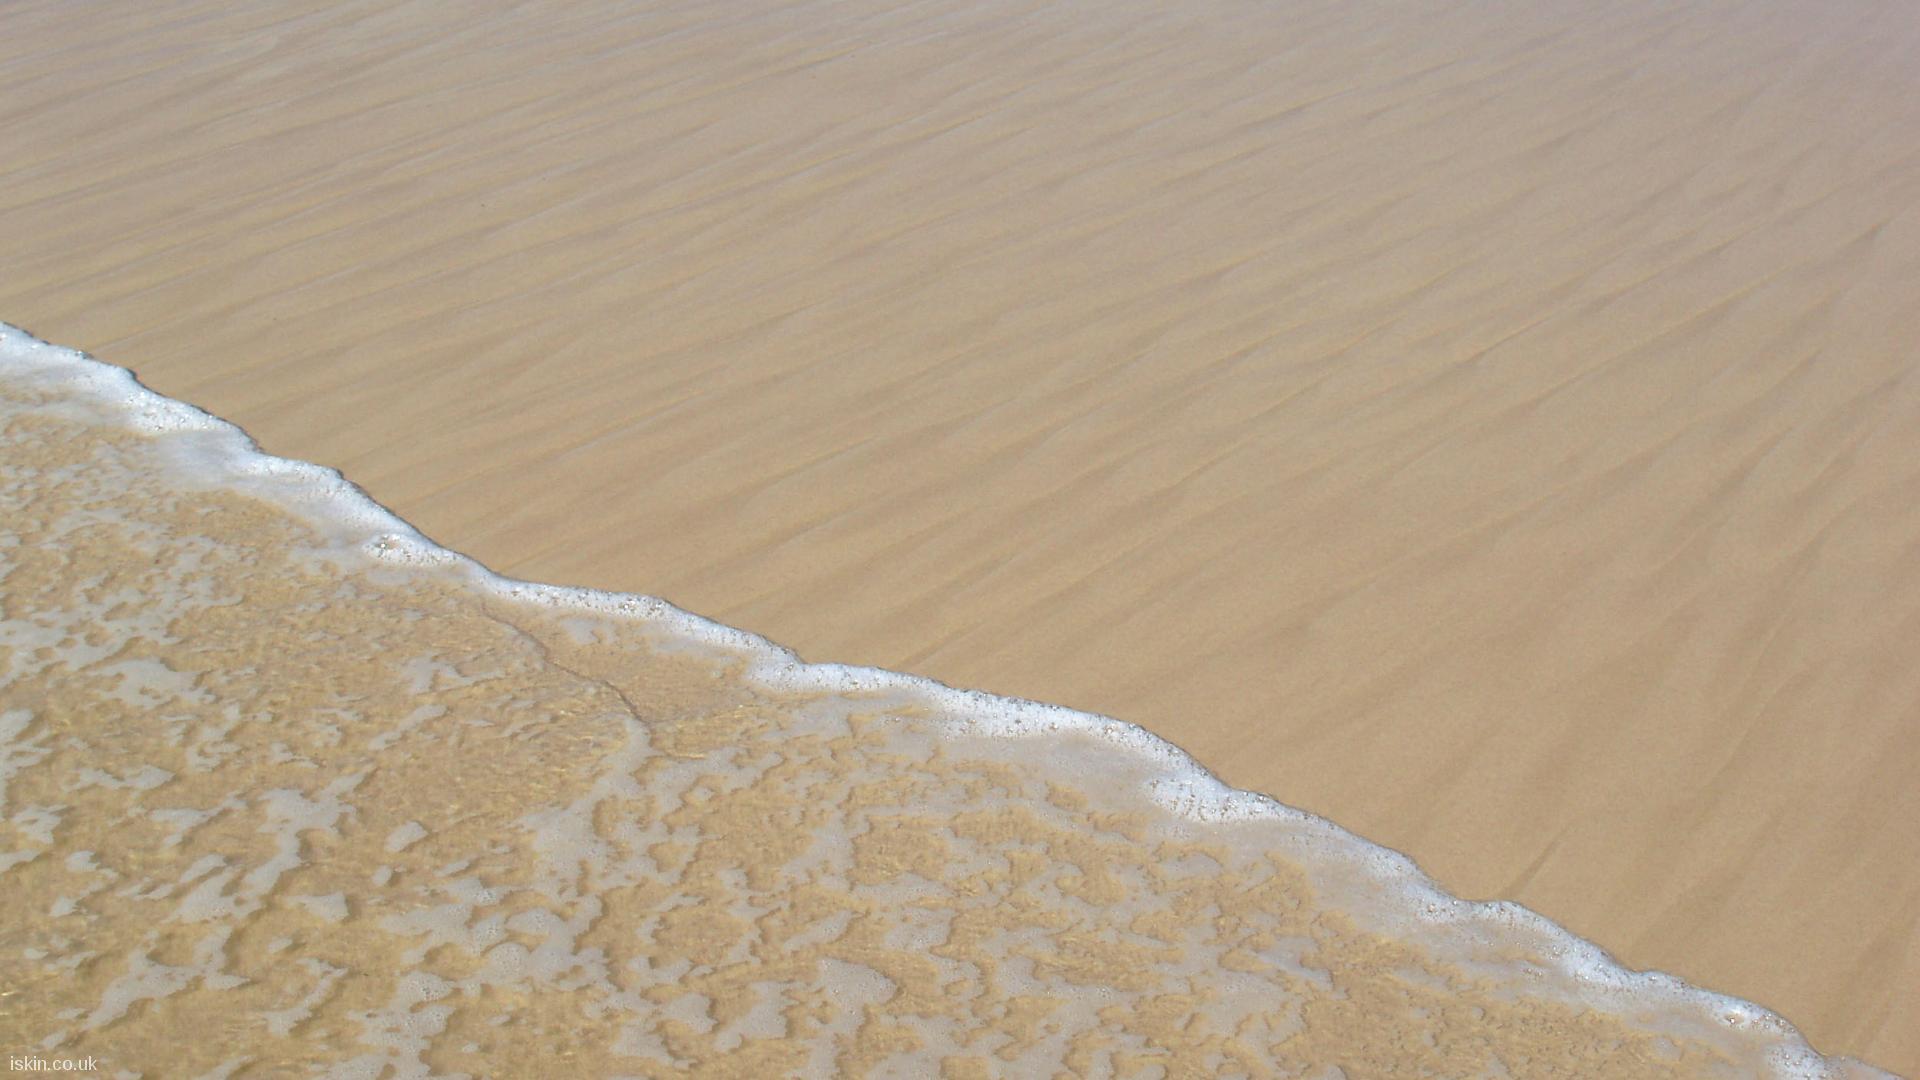 Sandy Beach Desktop Wallpaper Iskin Uk Full Hd Tv Home